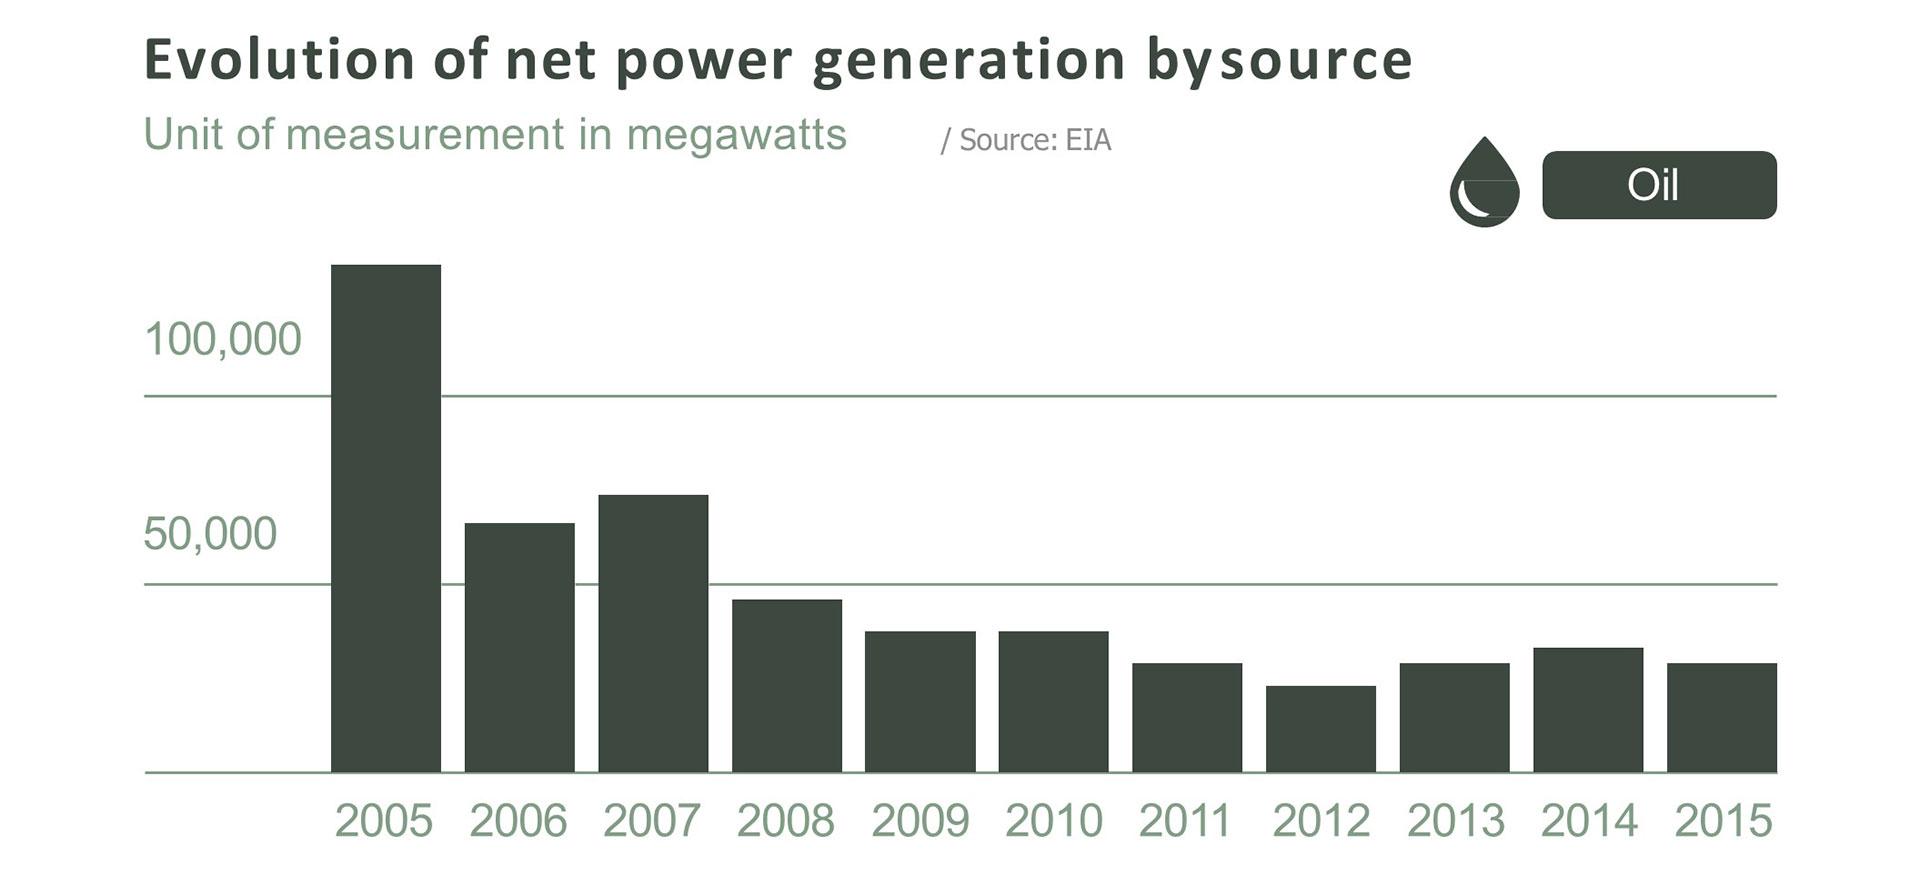 Evolution of net power generation of oil, by Doris Capurro.